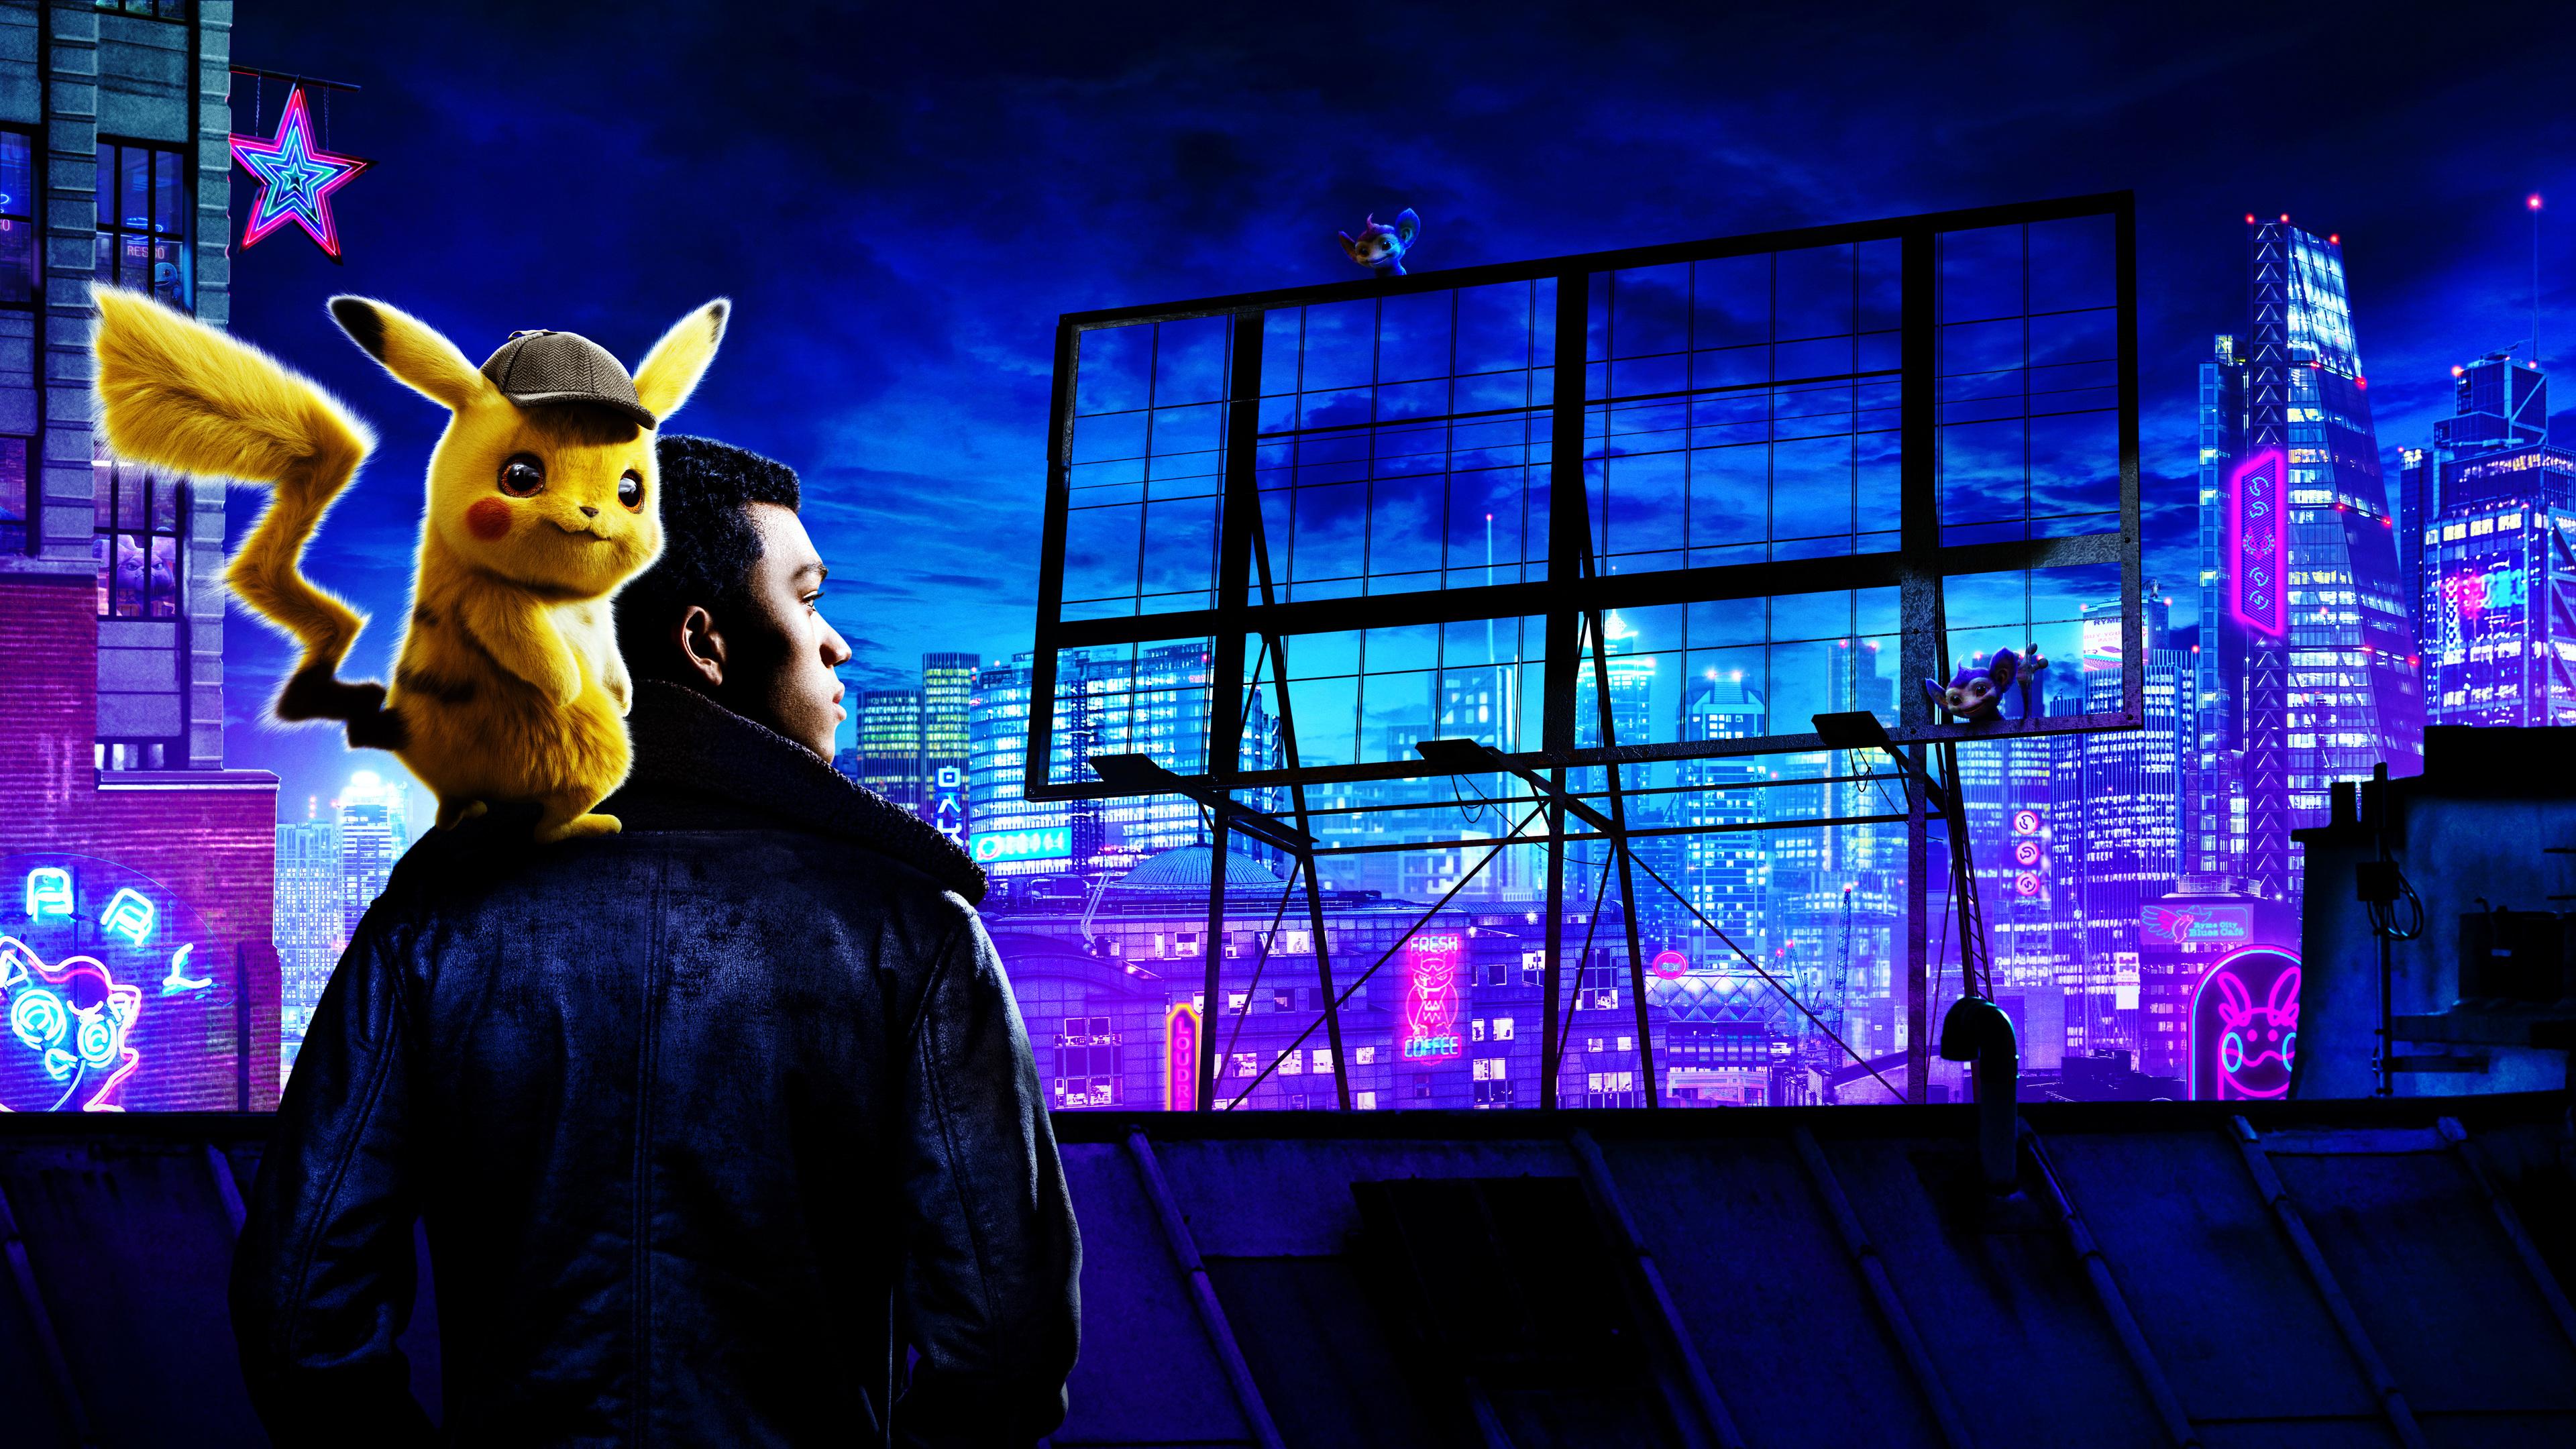 Pokemon Detective Pikachu Movie 4k pokemon detective pikachu wallpapers, movies wallpapers, hd ...